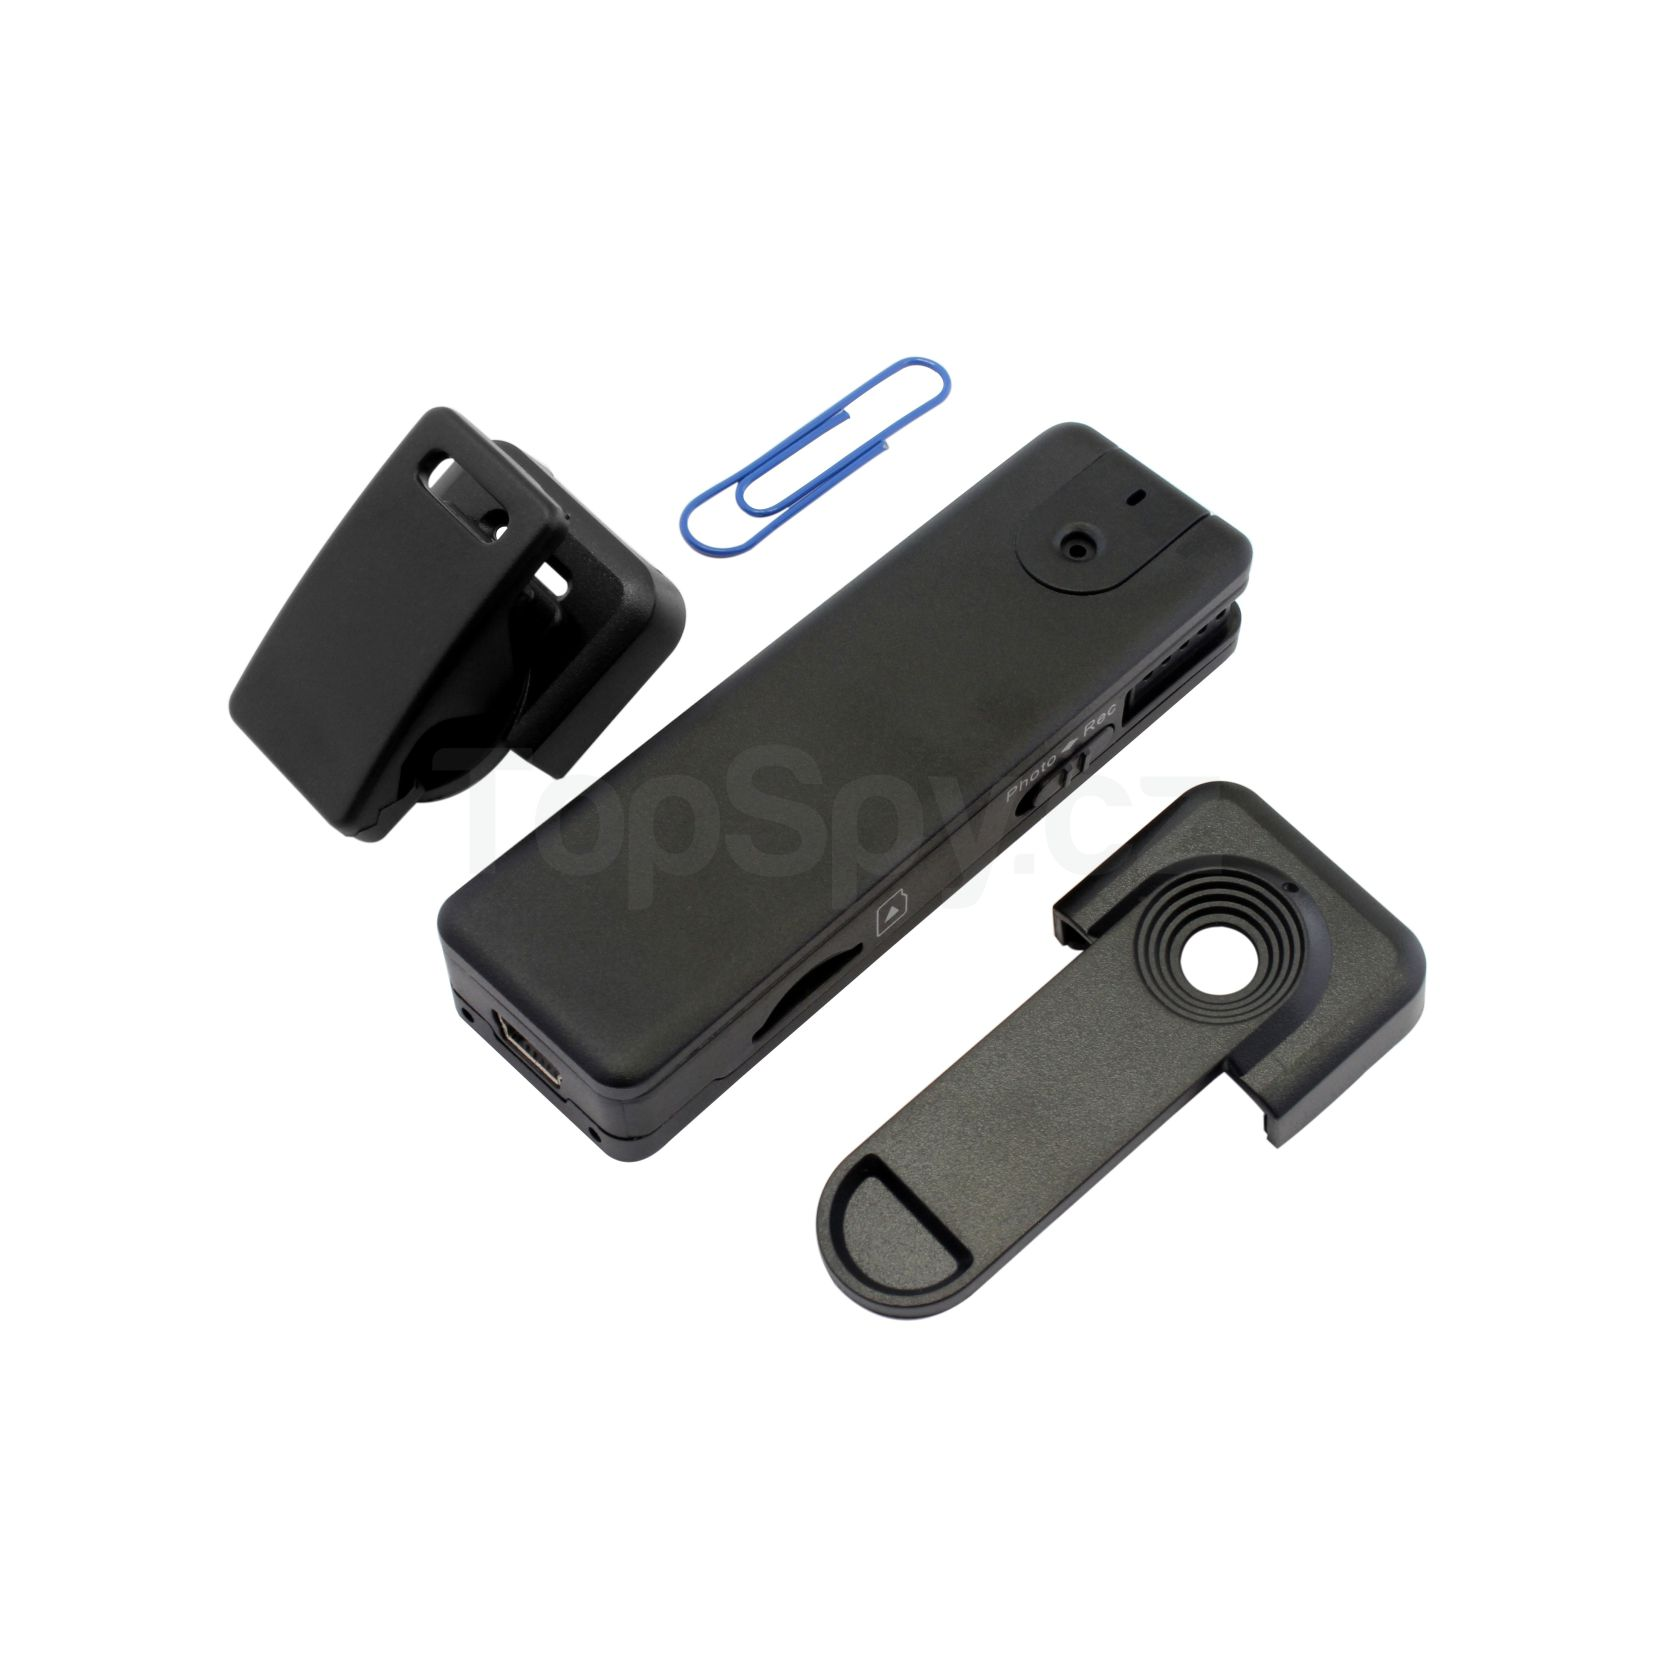 Skrytá miniaturní kamera TopSpy mDVR 350 FHD